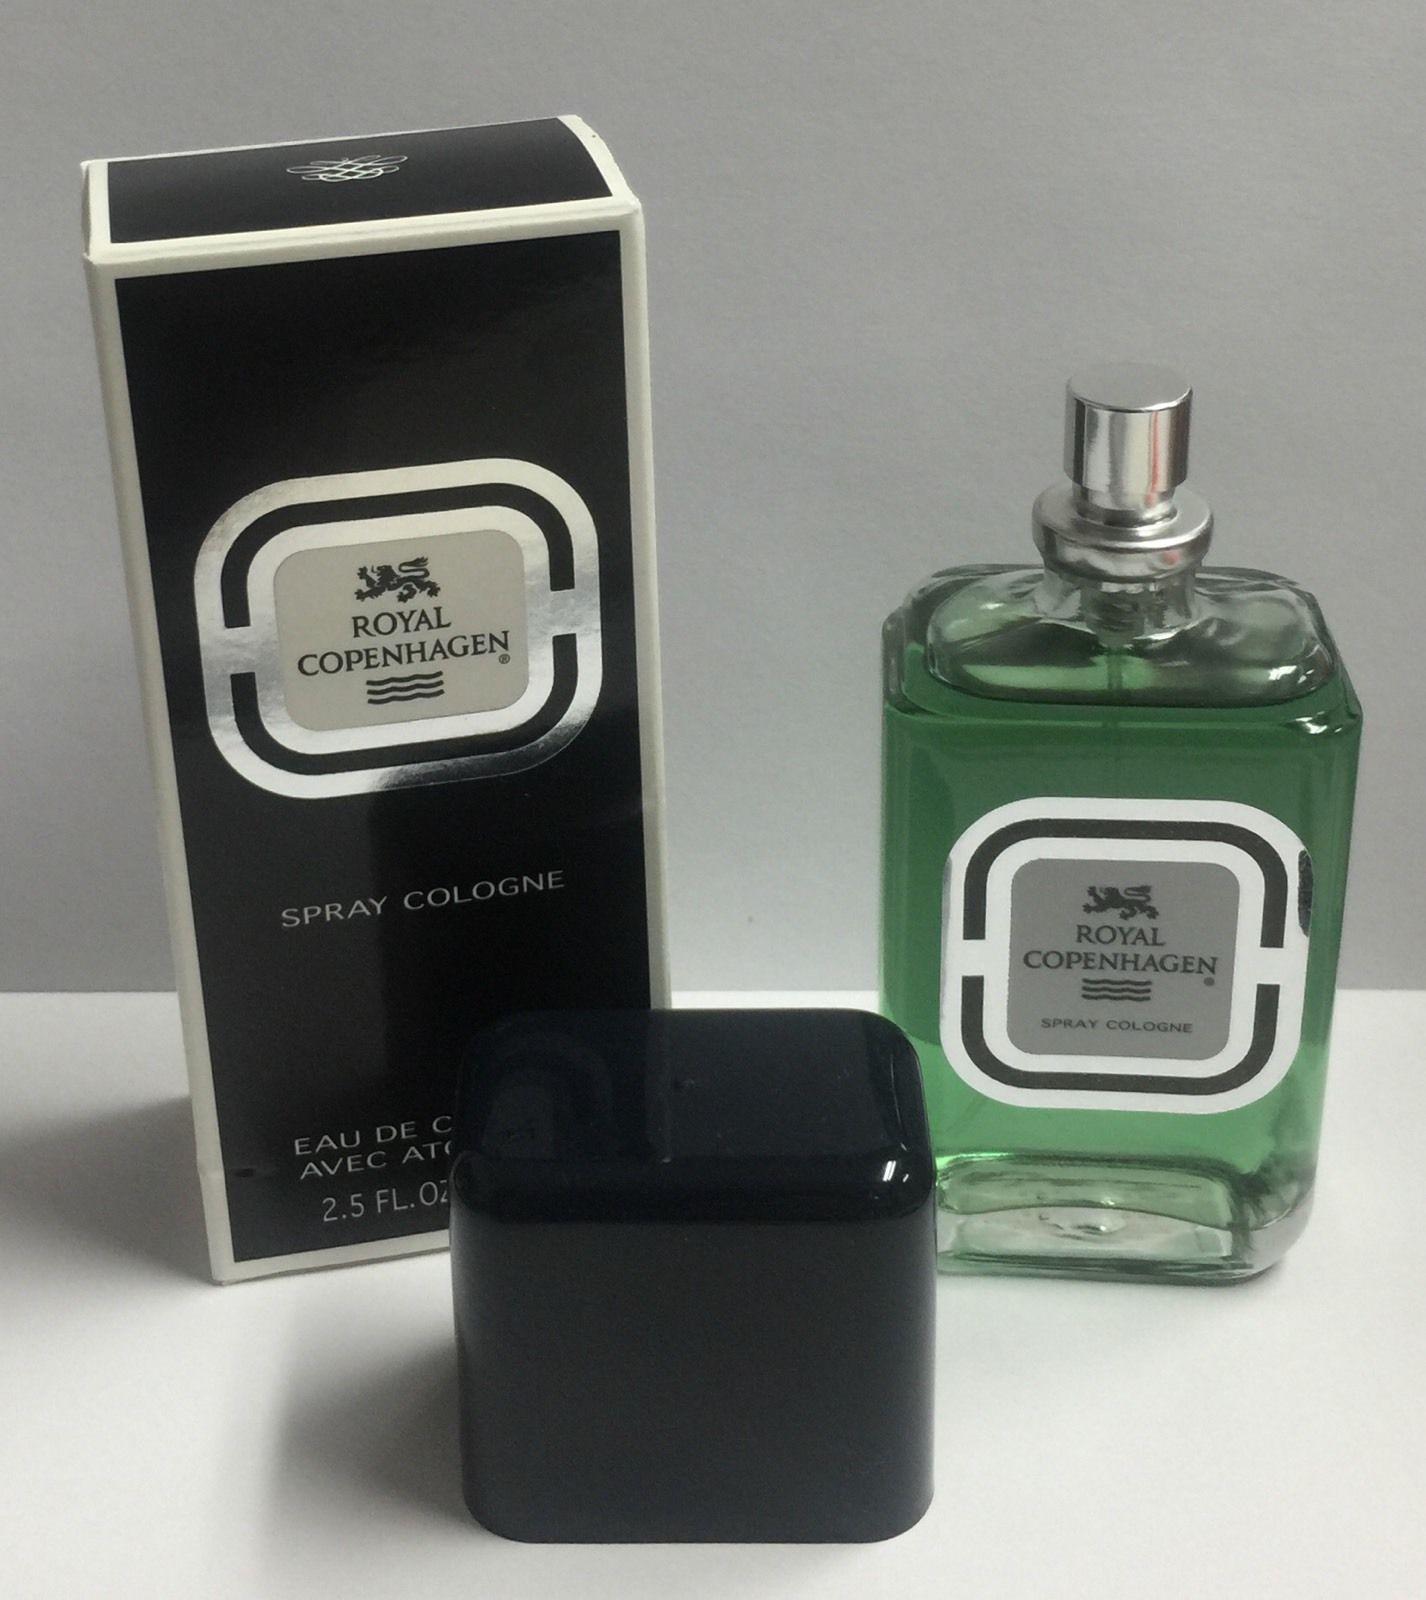 Royal Copenhagen EDC Spray Cologne 2.5 oz/ 75 ml MEN, New in box & Sealed.